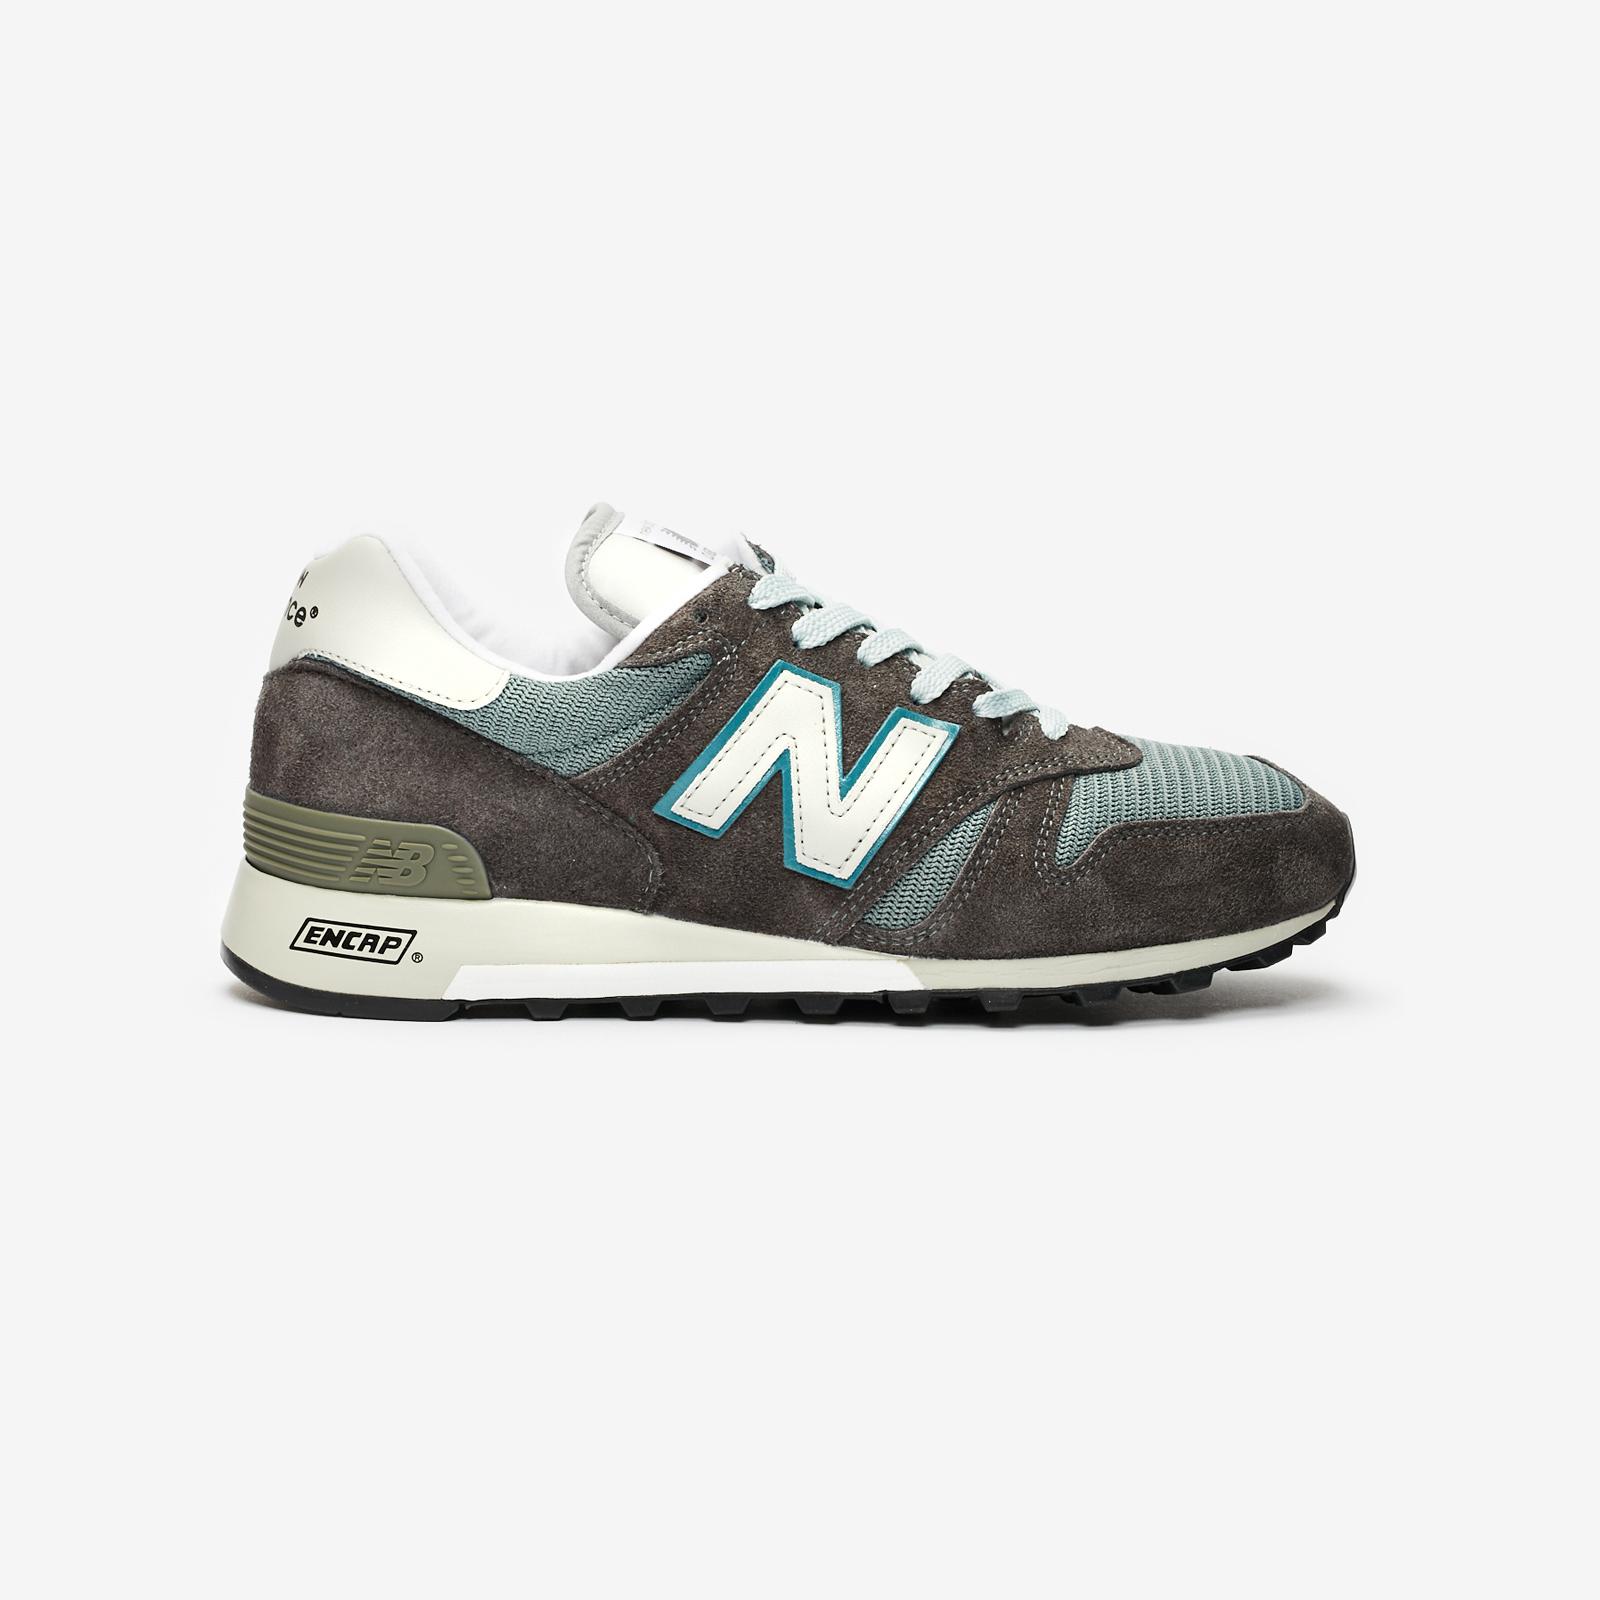 New Balance M1300 - M1300cls - SNS   sneakers & streetwear online ...